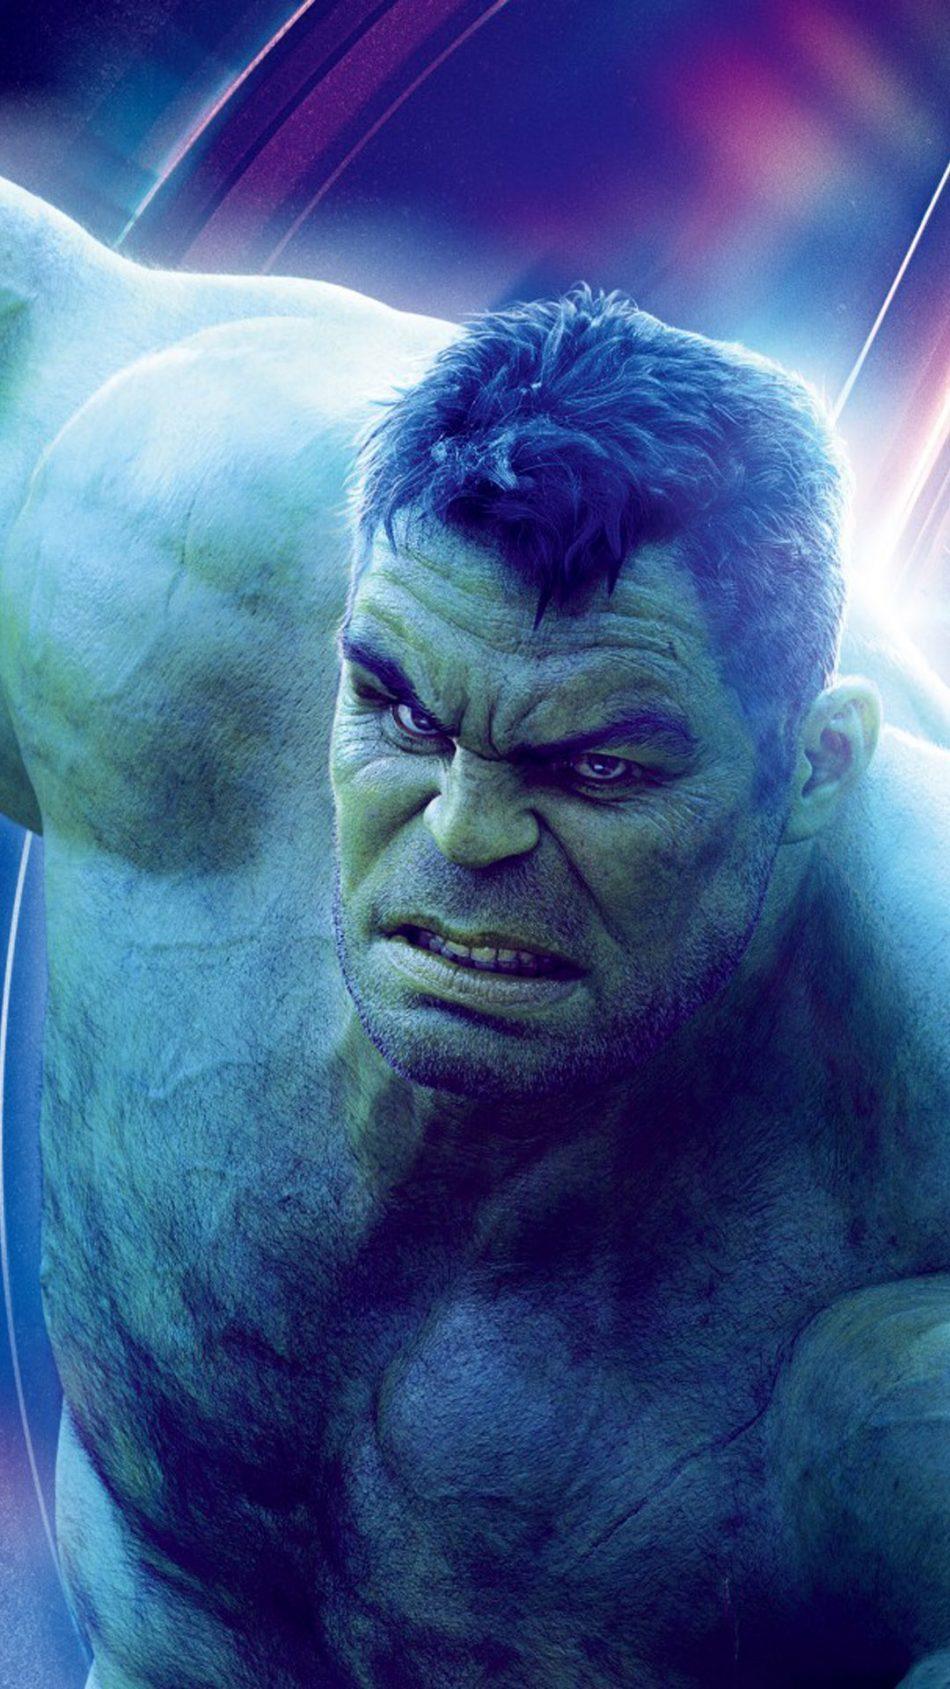 Beautiful Wallpaper Mobile Hulk - Hulk-In-Avengers-Infinity-War-HD-Mobile-Wallpaper-950x1689  Collection_315599.jpg